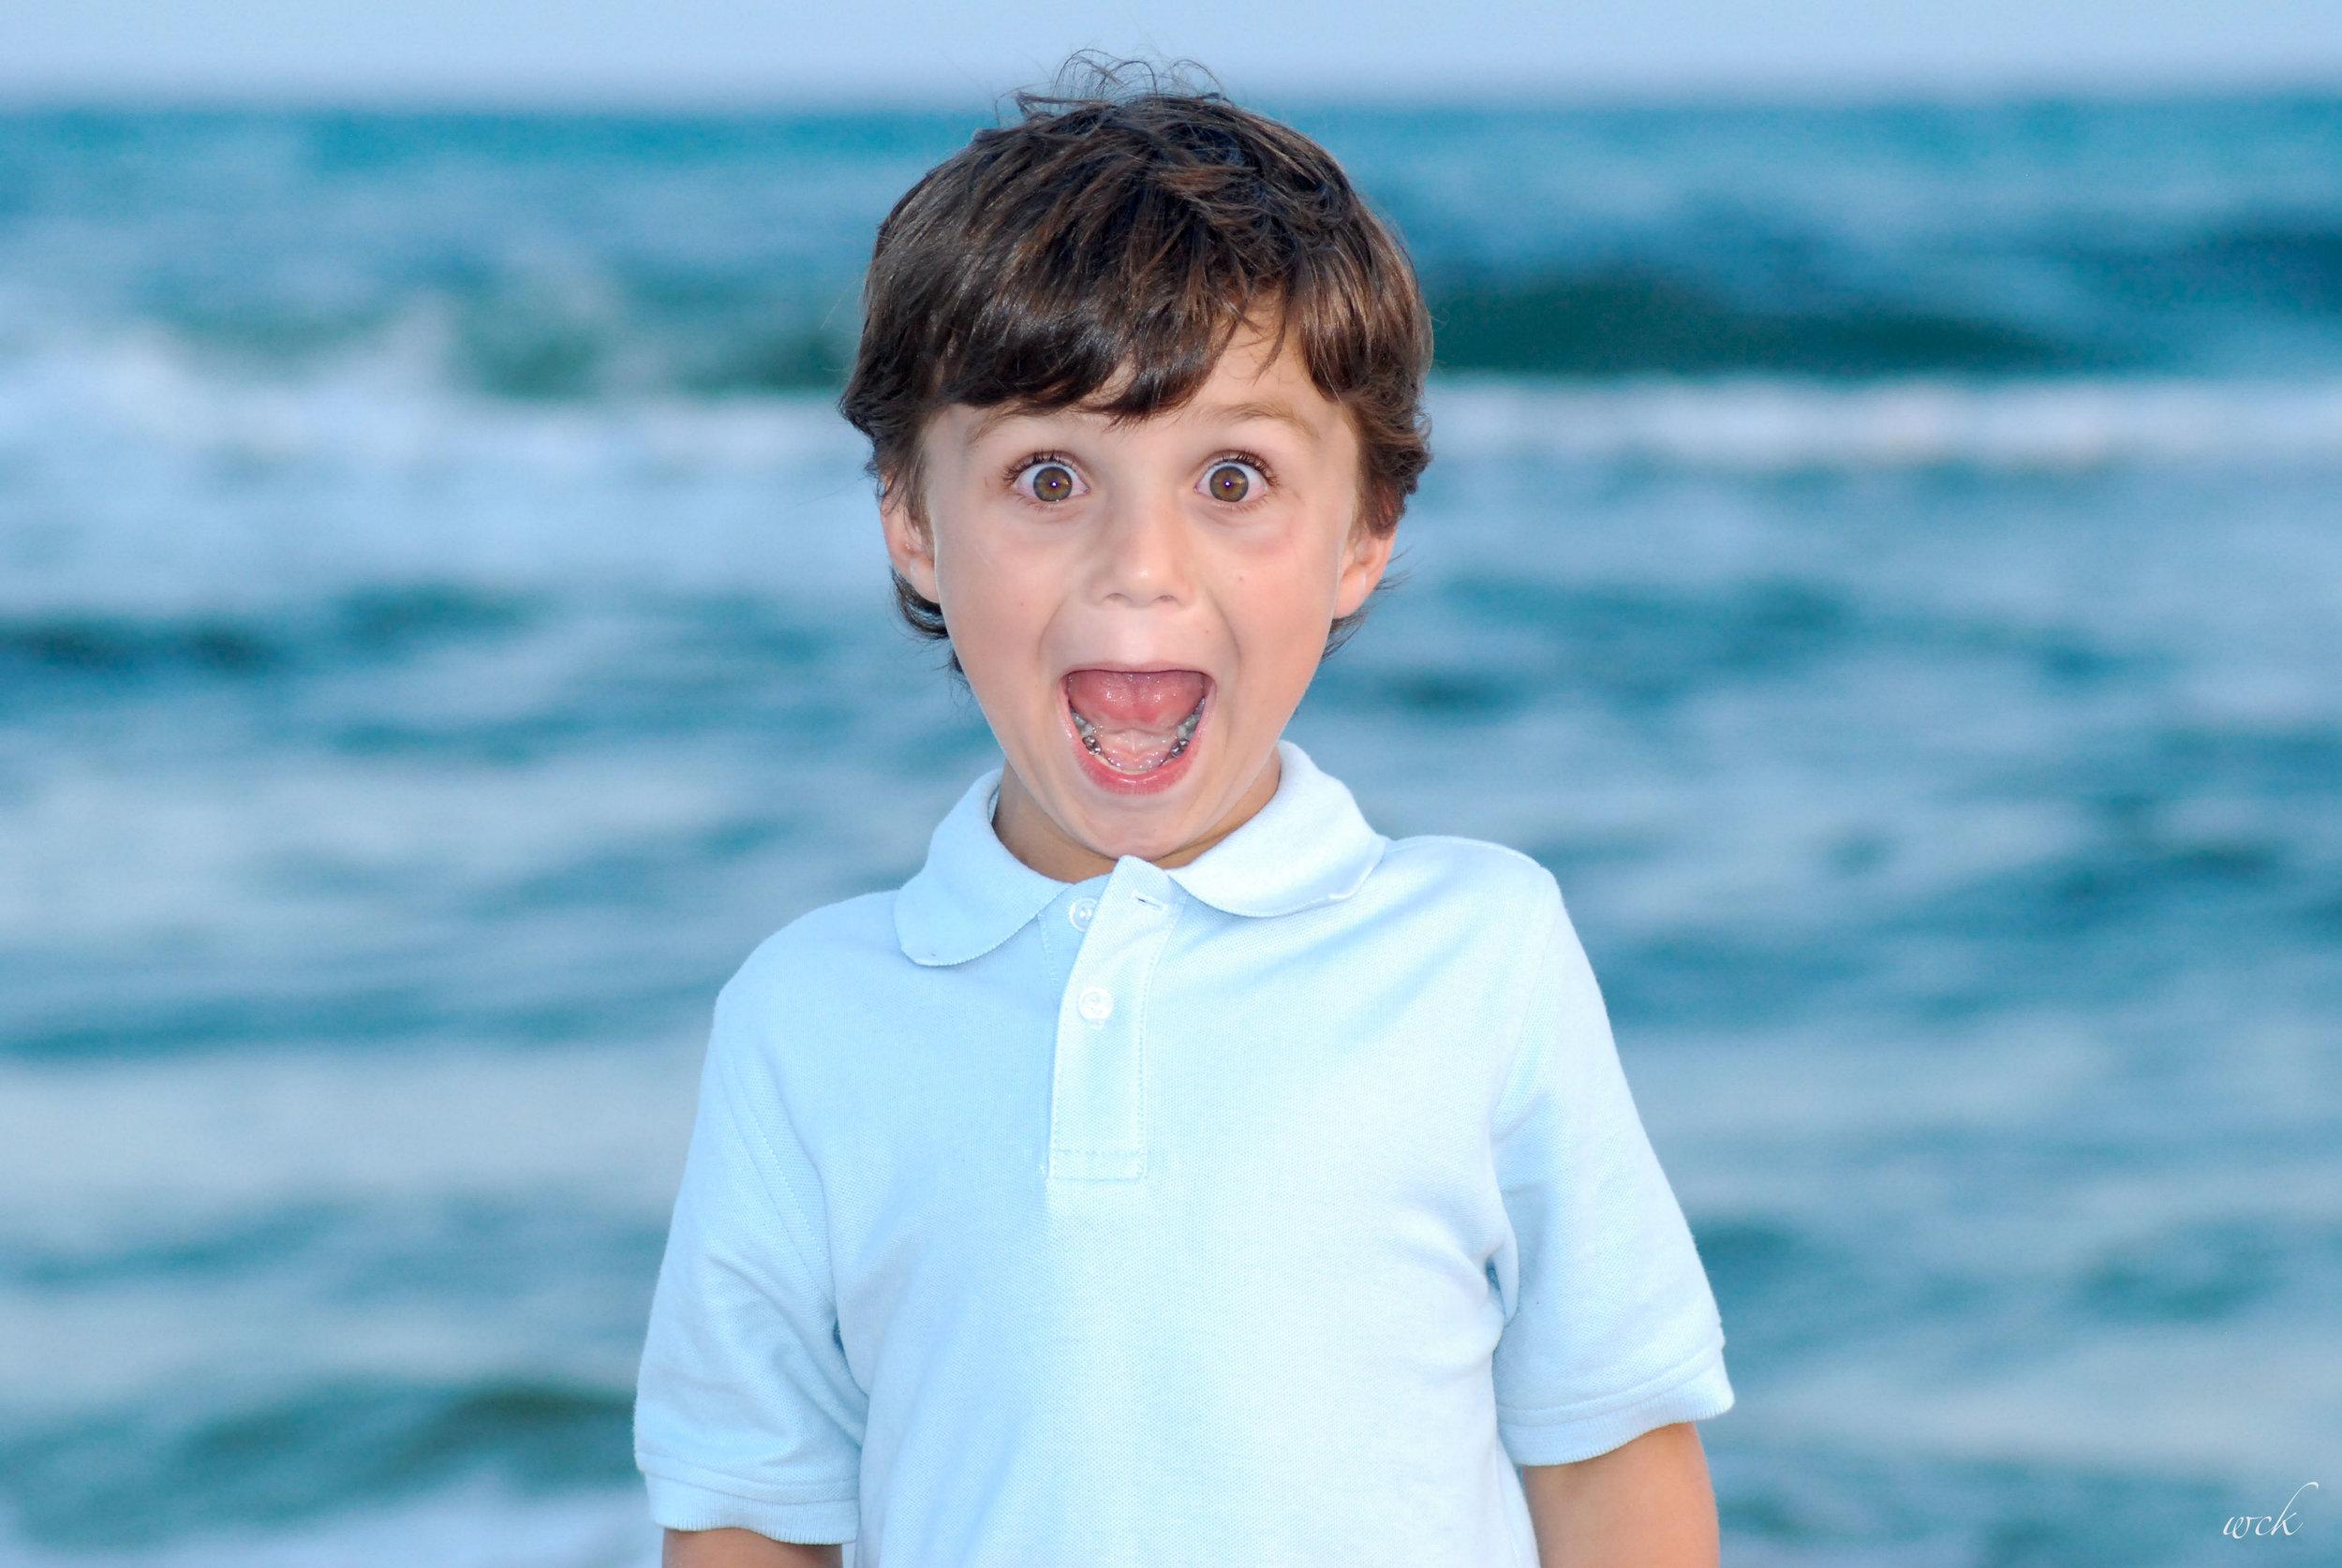 05 28 07 Kesler Beach Portraits 065 Top 100 - web.jpg